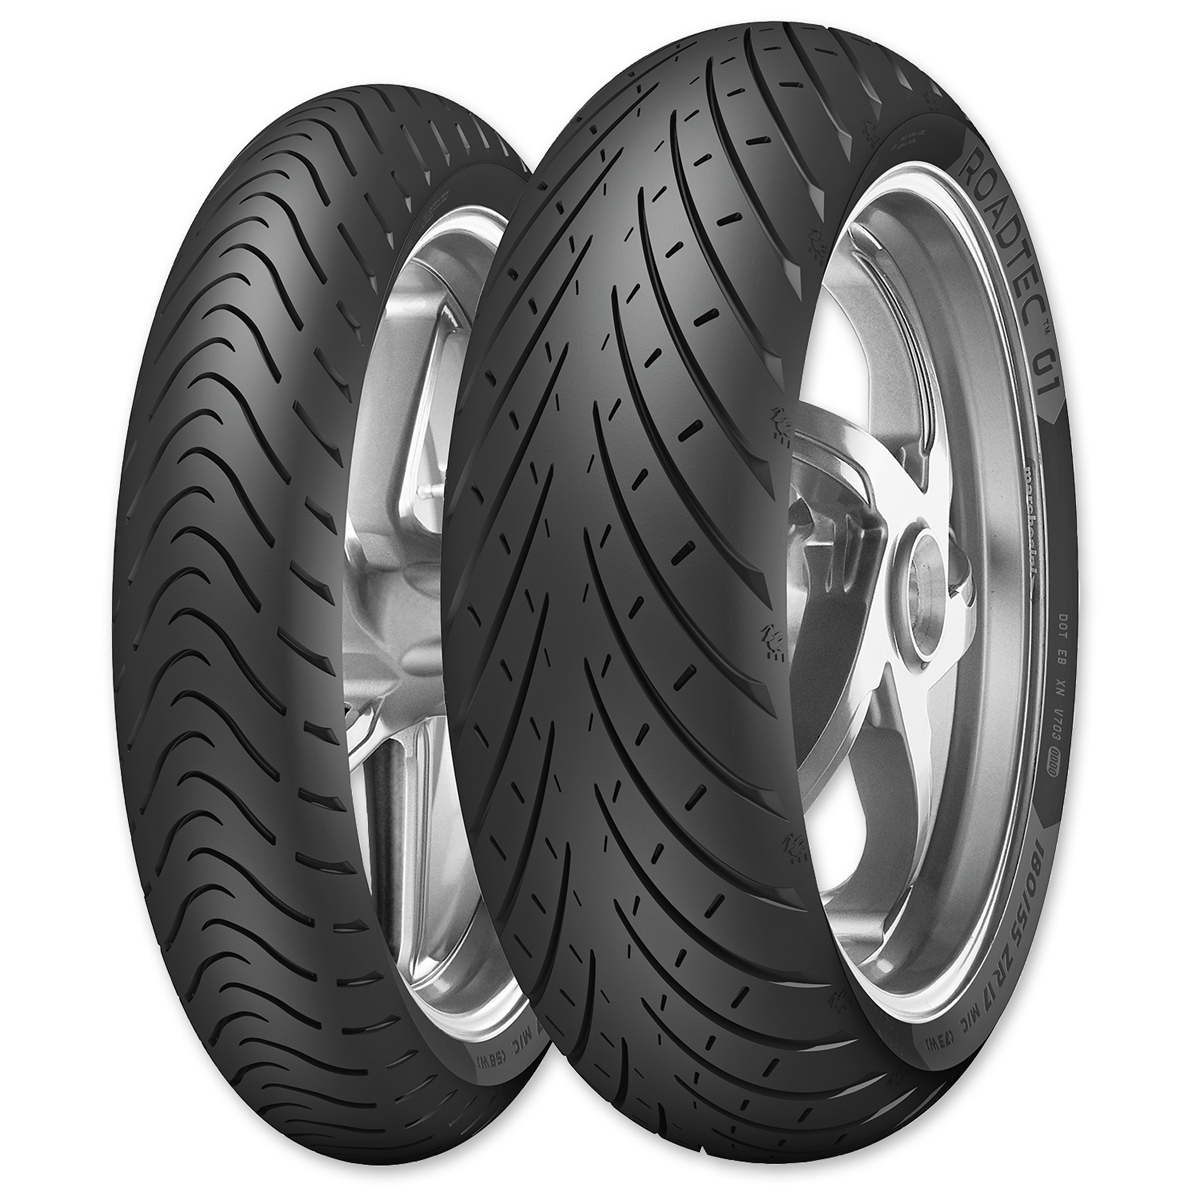 Metzeler Roadtec 01 190/55ZR17 Rear Tire HWM